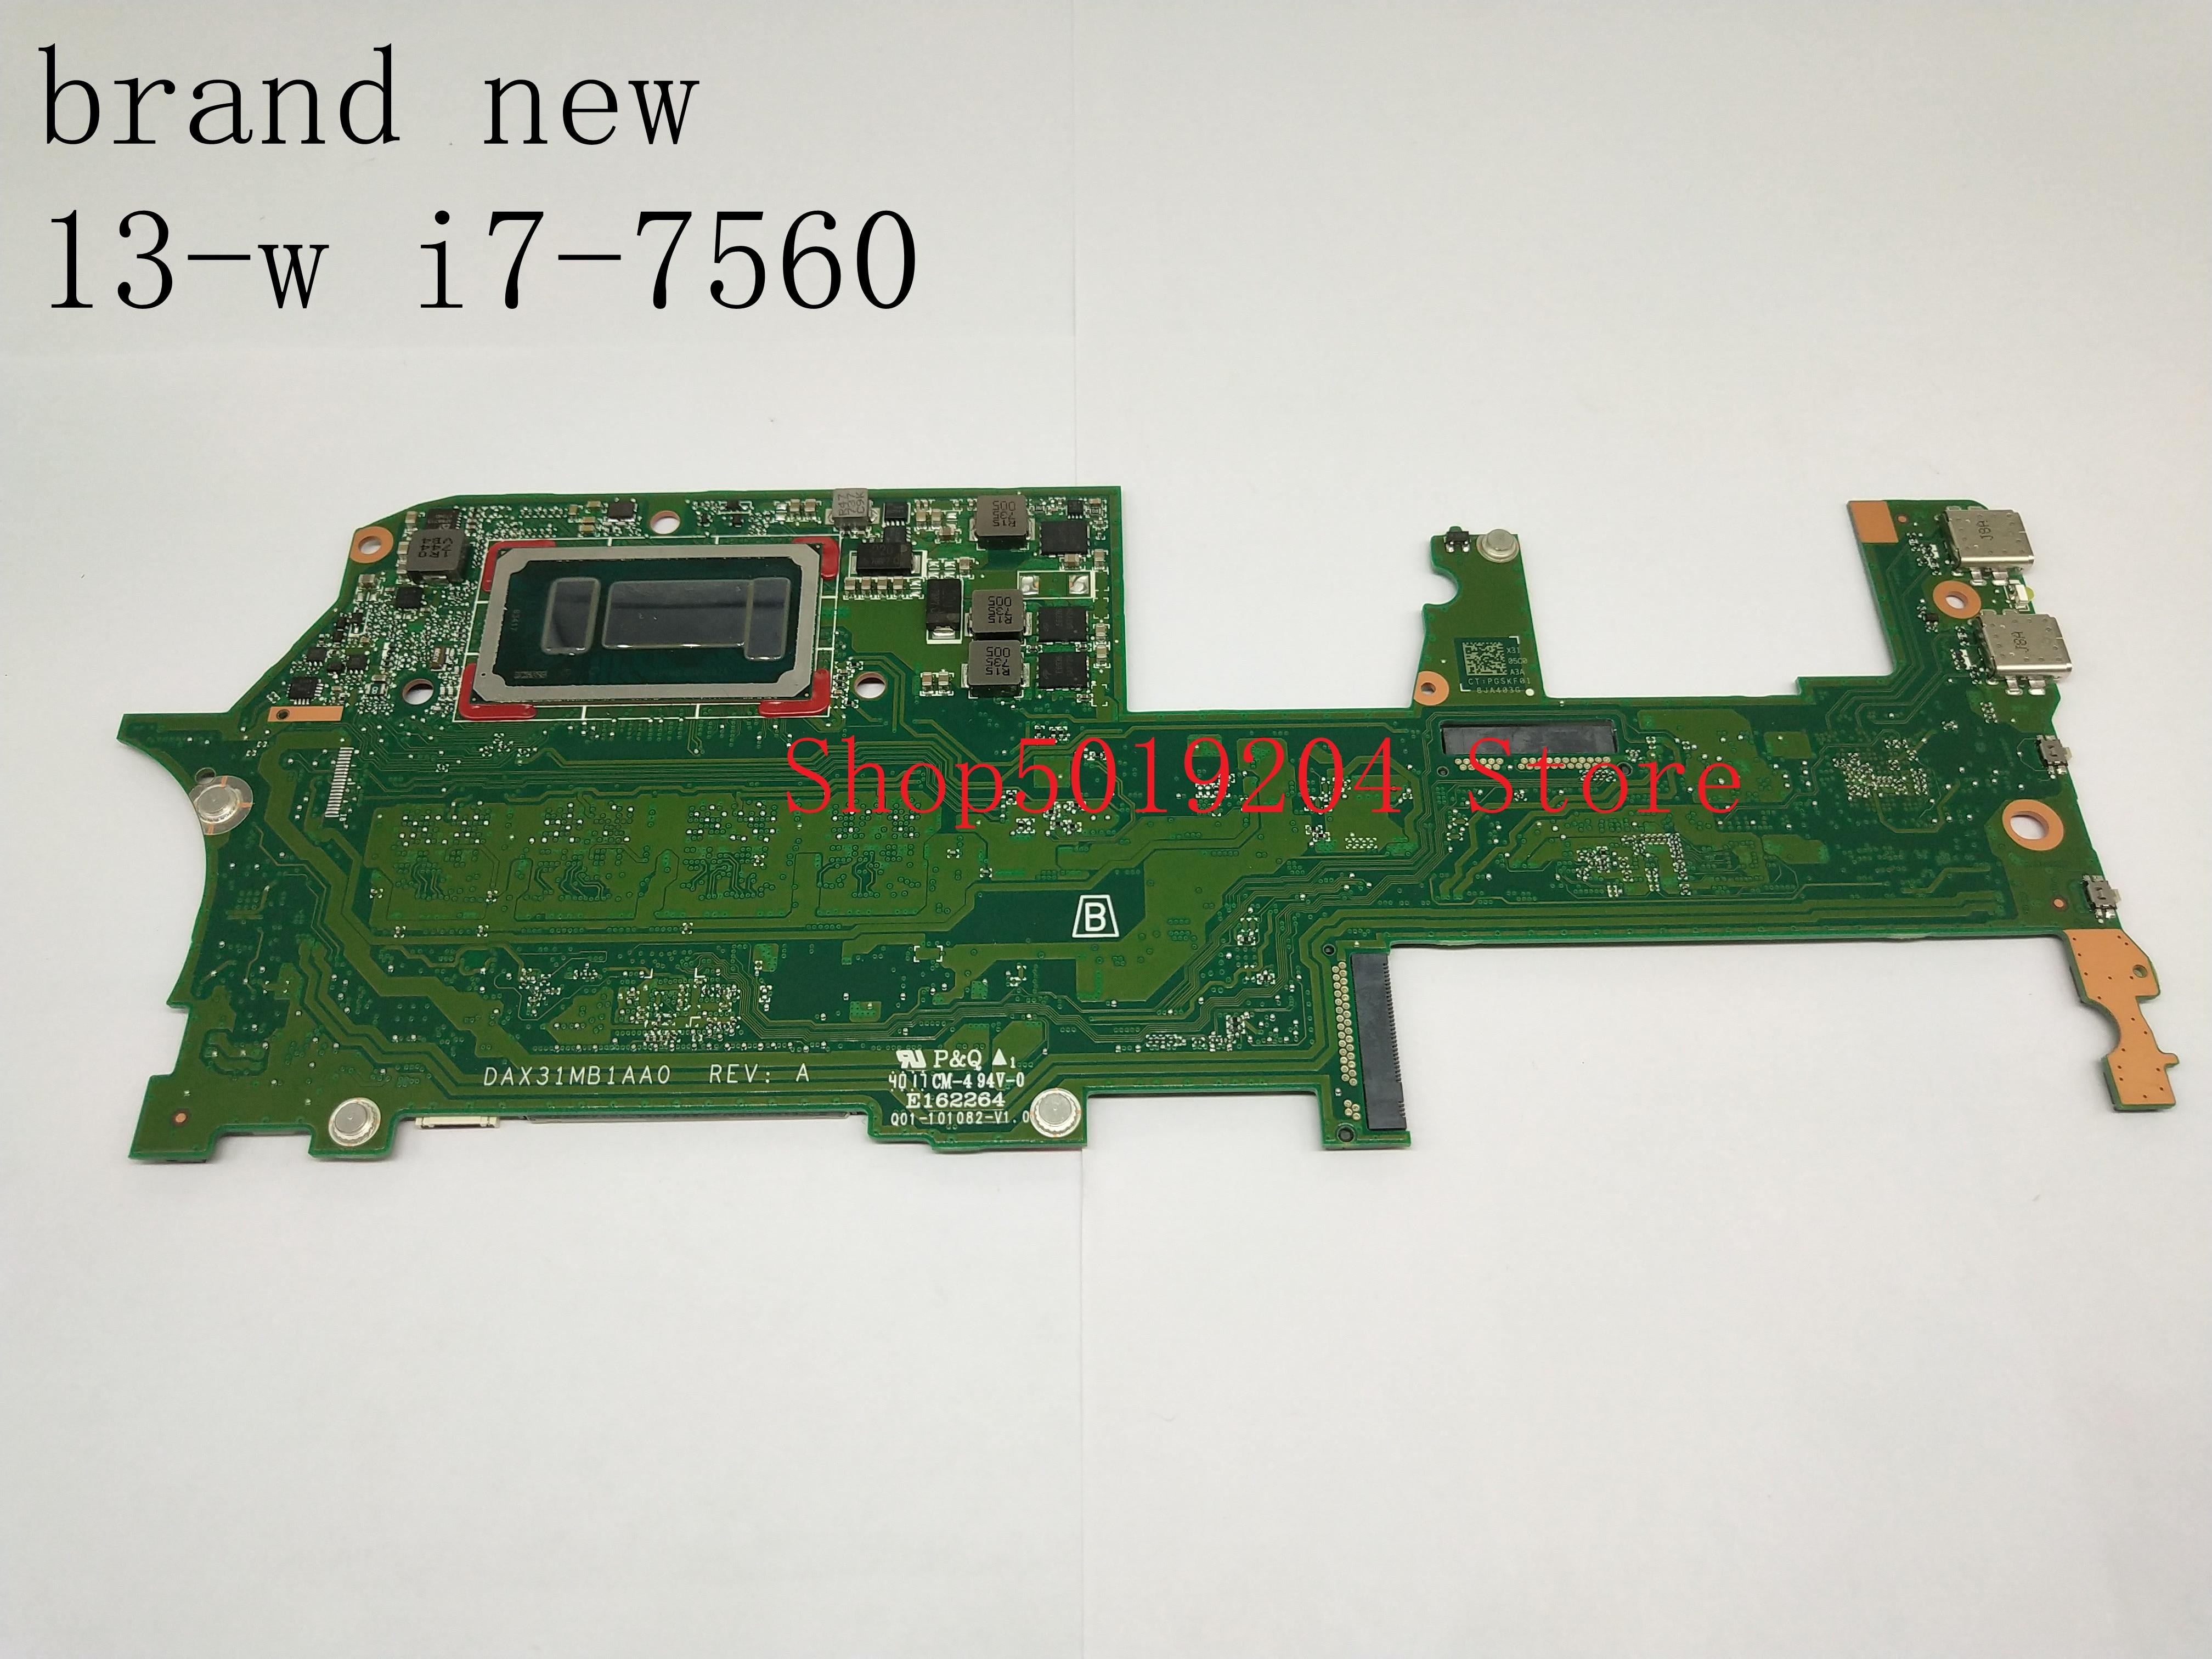 Nueva placa base para ordenador portátil HP Spectre X360 13-W 13-AC i7-7560U SR366 DAX31MB1AA0 16GB